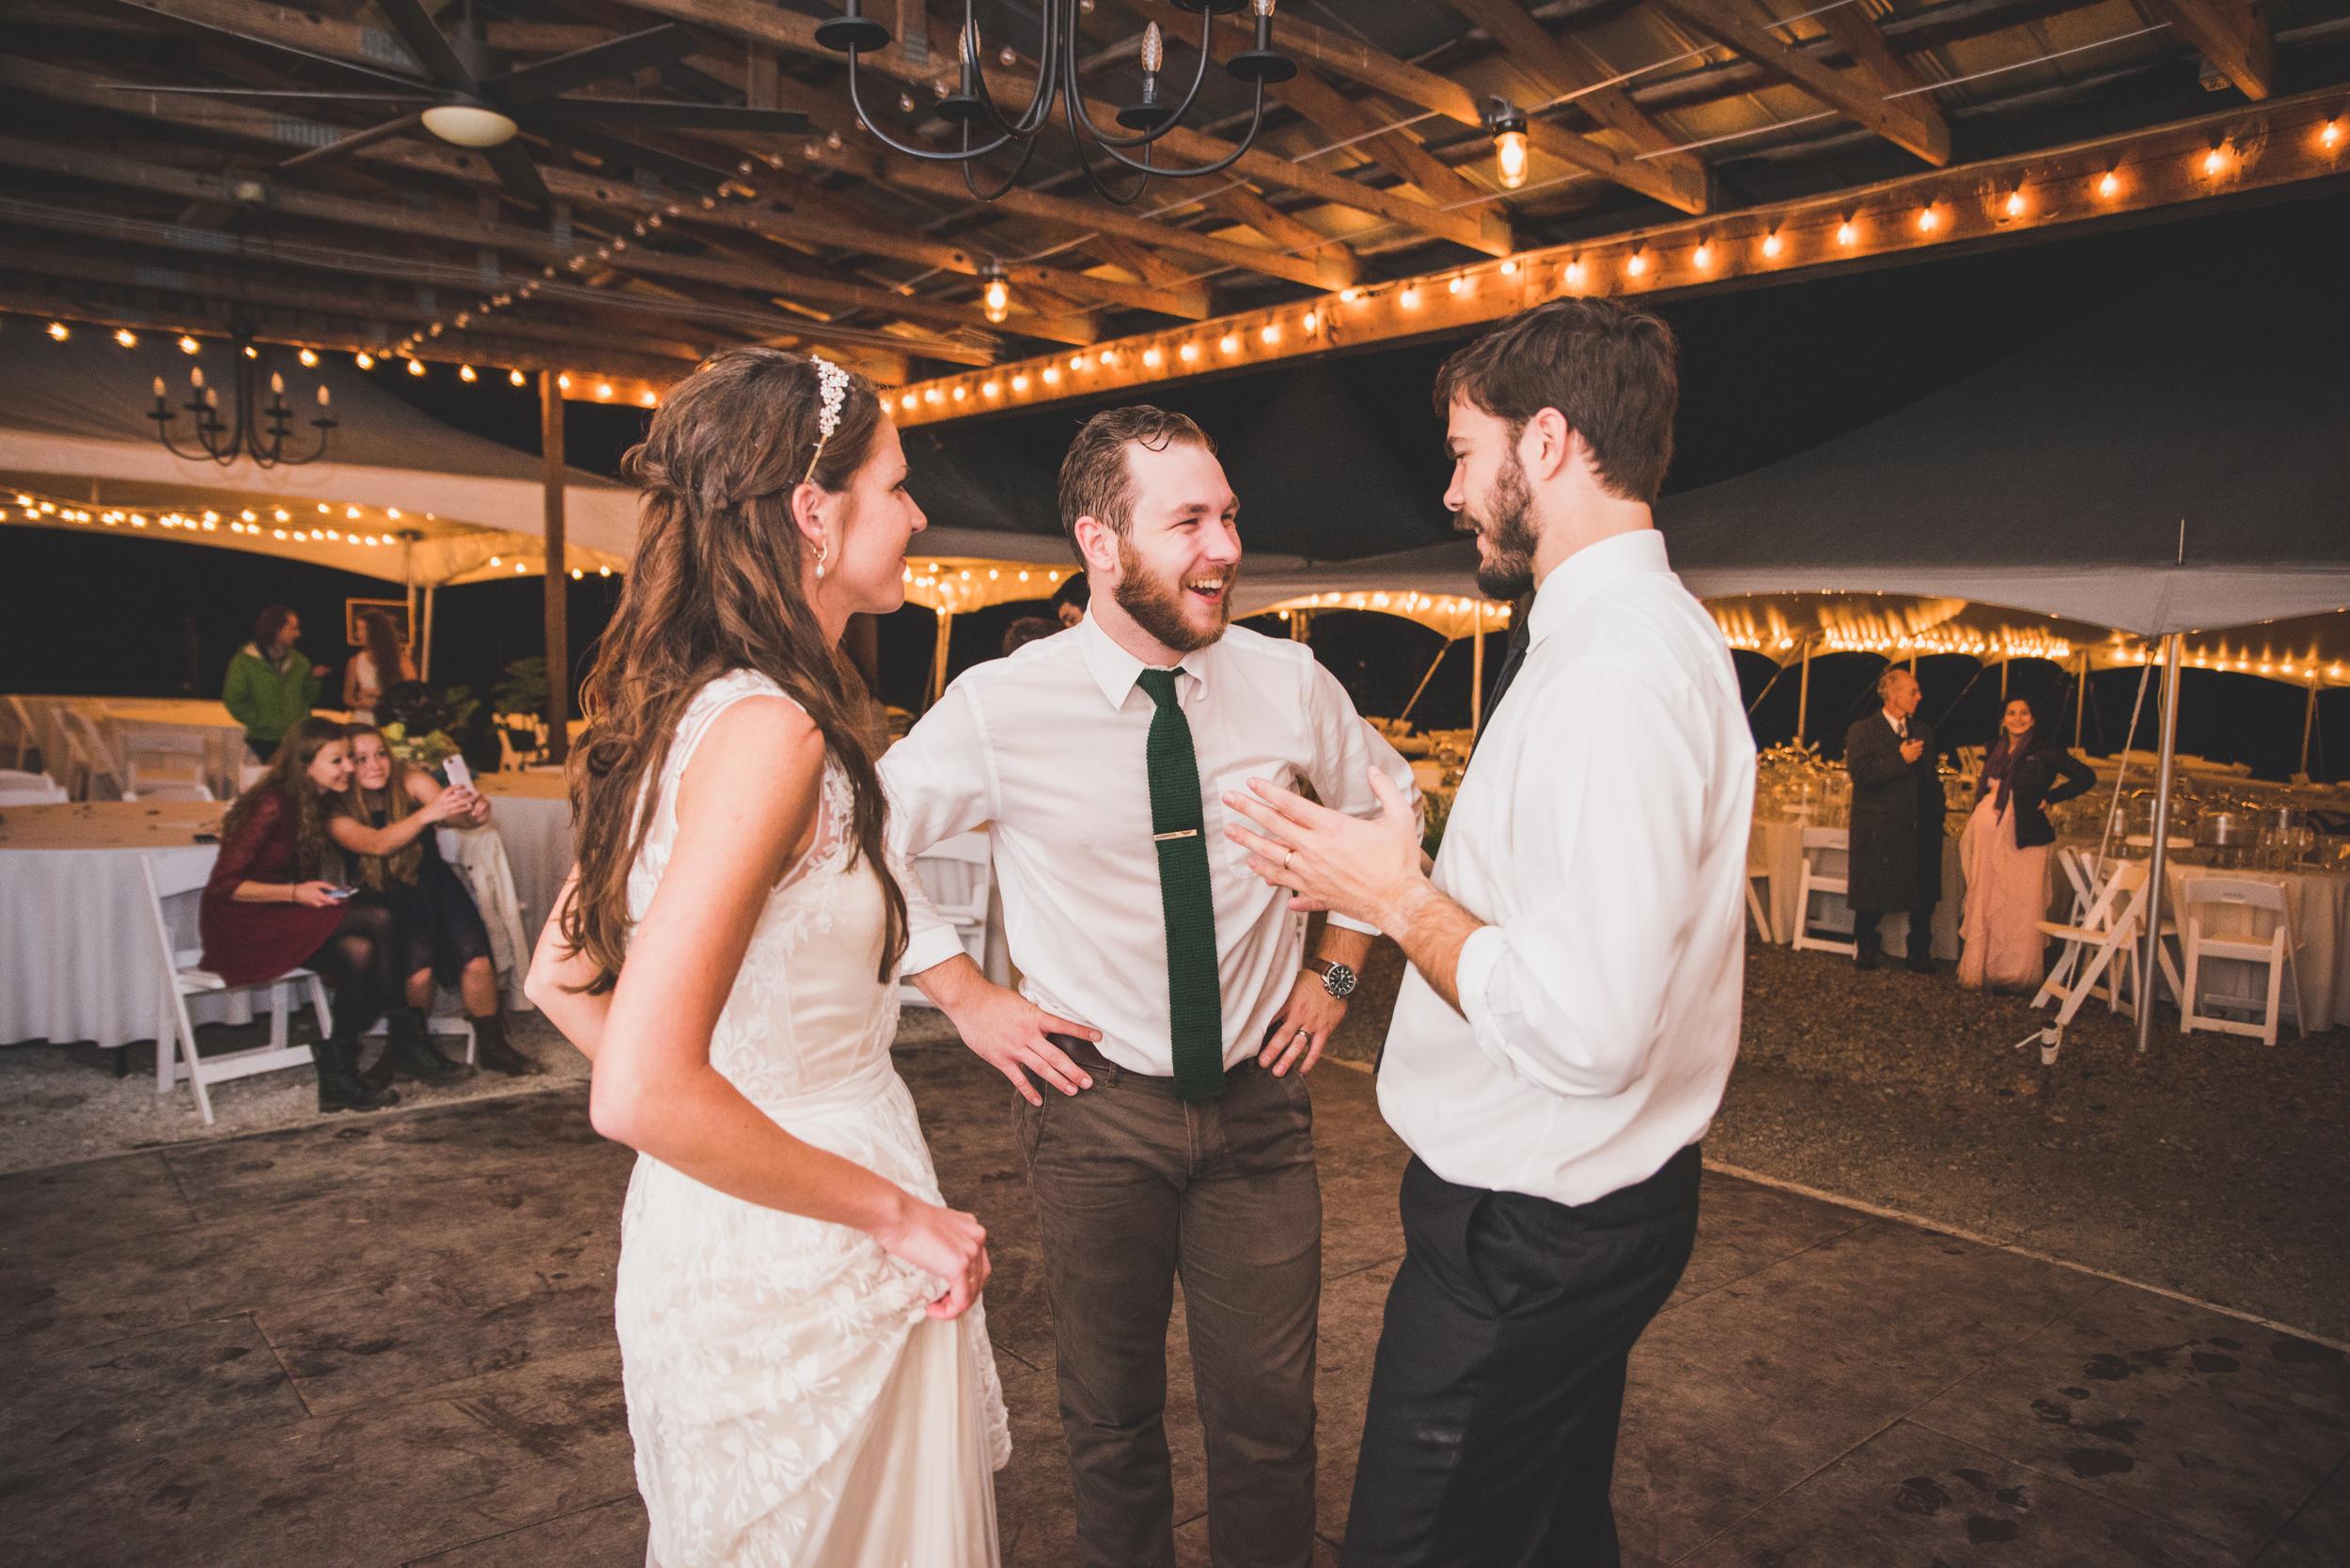 Nashville-Wedding-Photographer-John-Myers-66.jpg